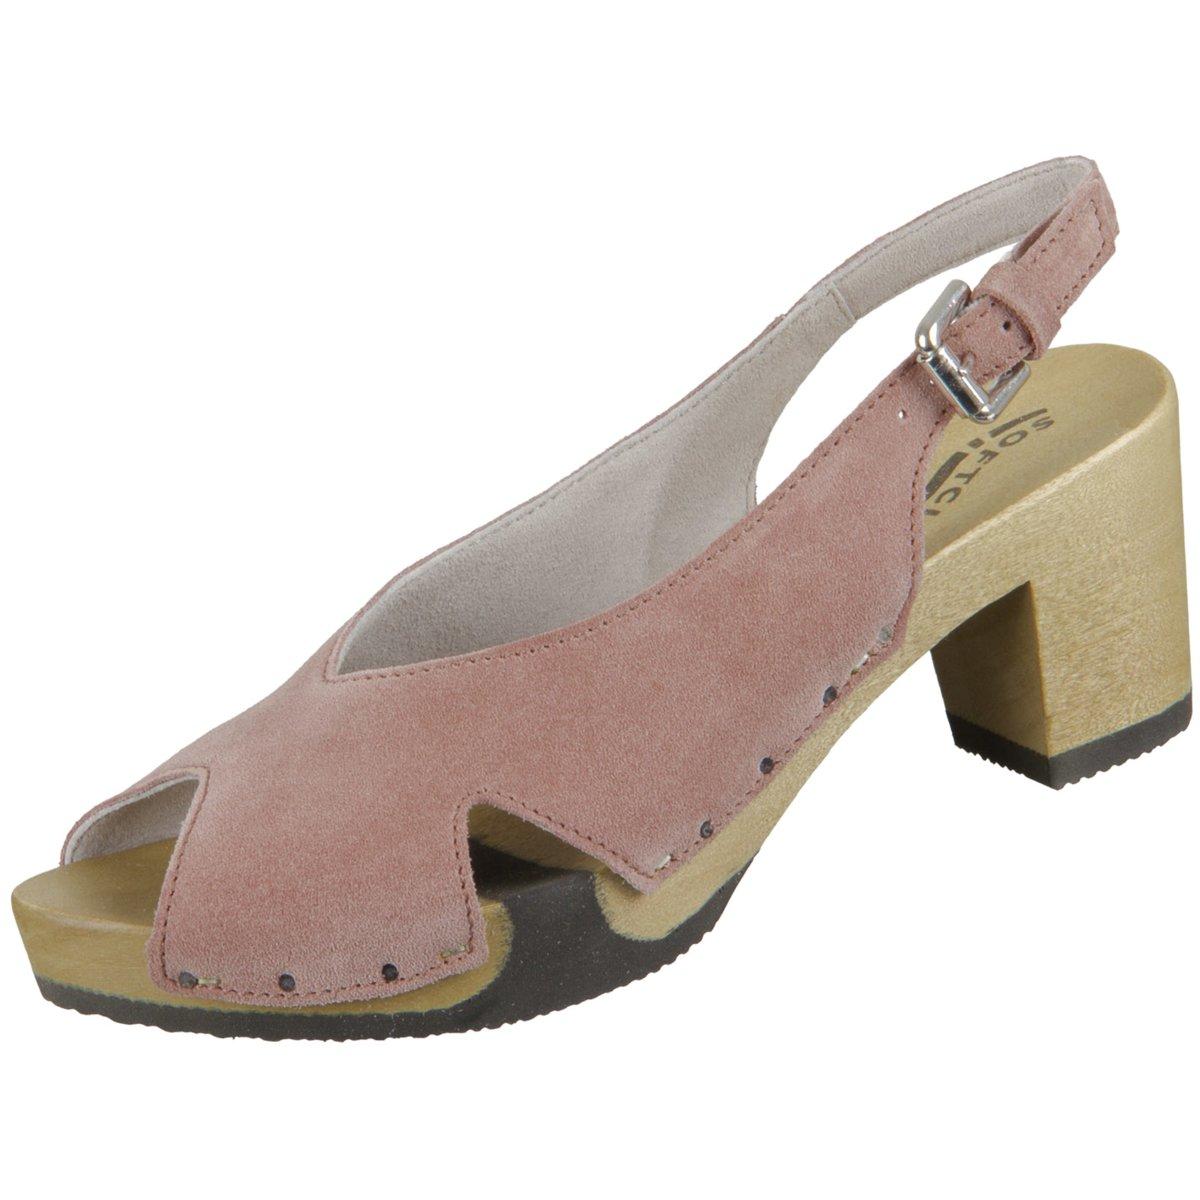 Details zu Softclox Damen Sandaletten S3463 WIEBKE ROSE rosa 858612